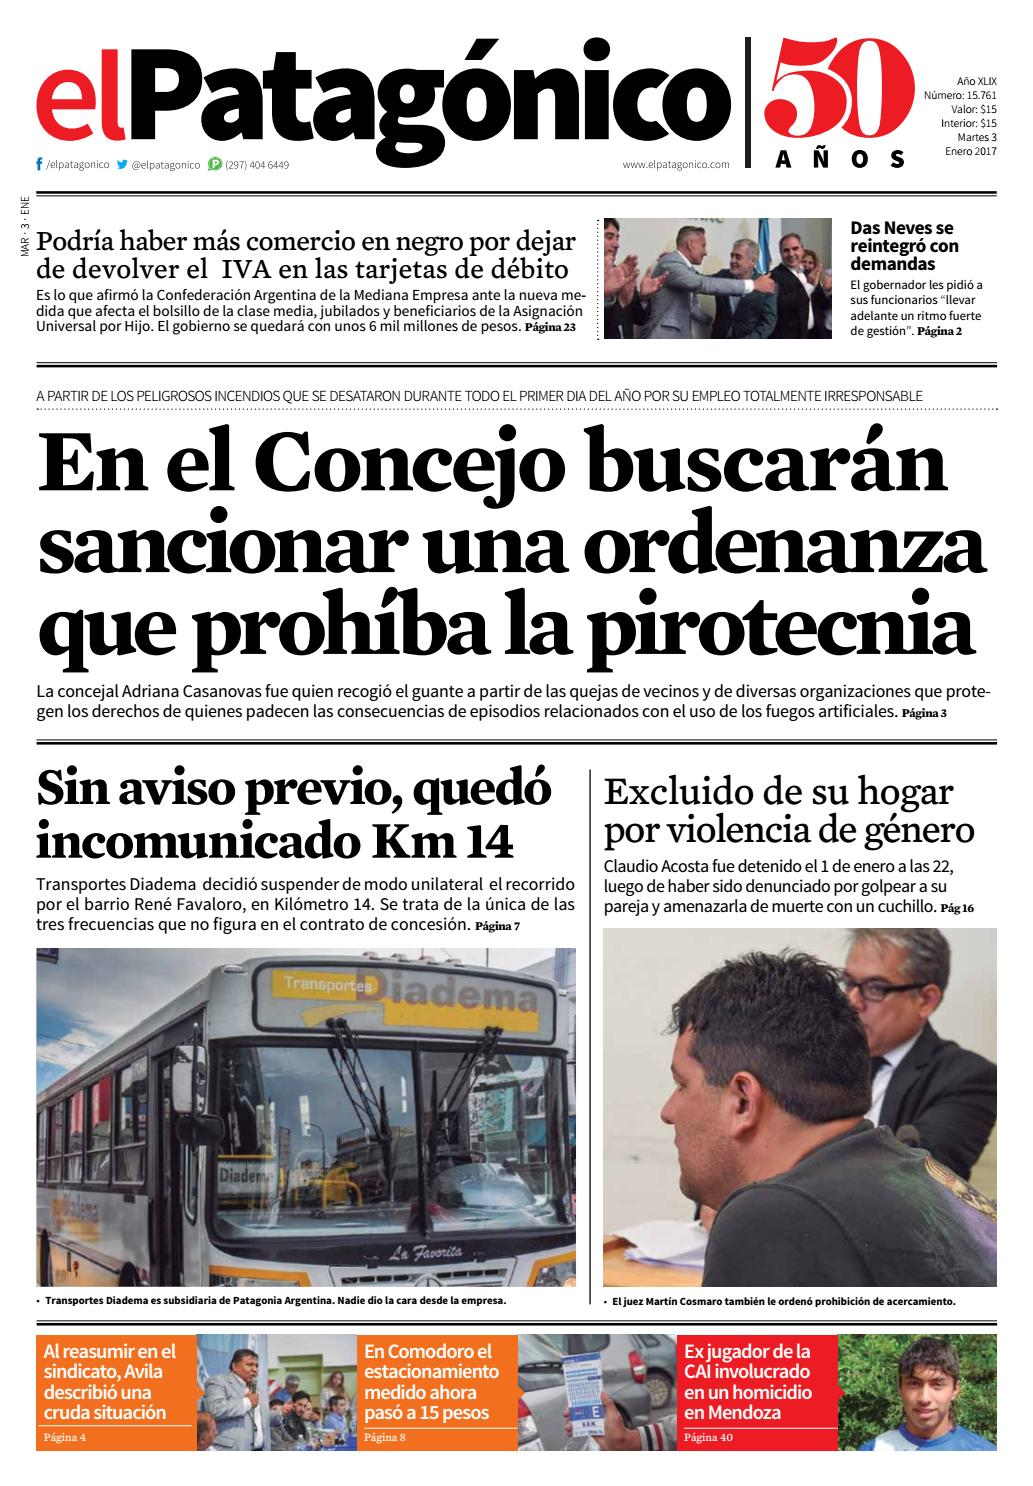 edicion225802012017.pdf by El Patagonico - issuu 4ae68a7cd1527